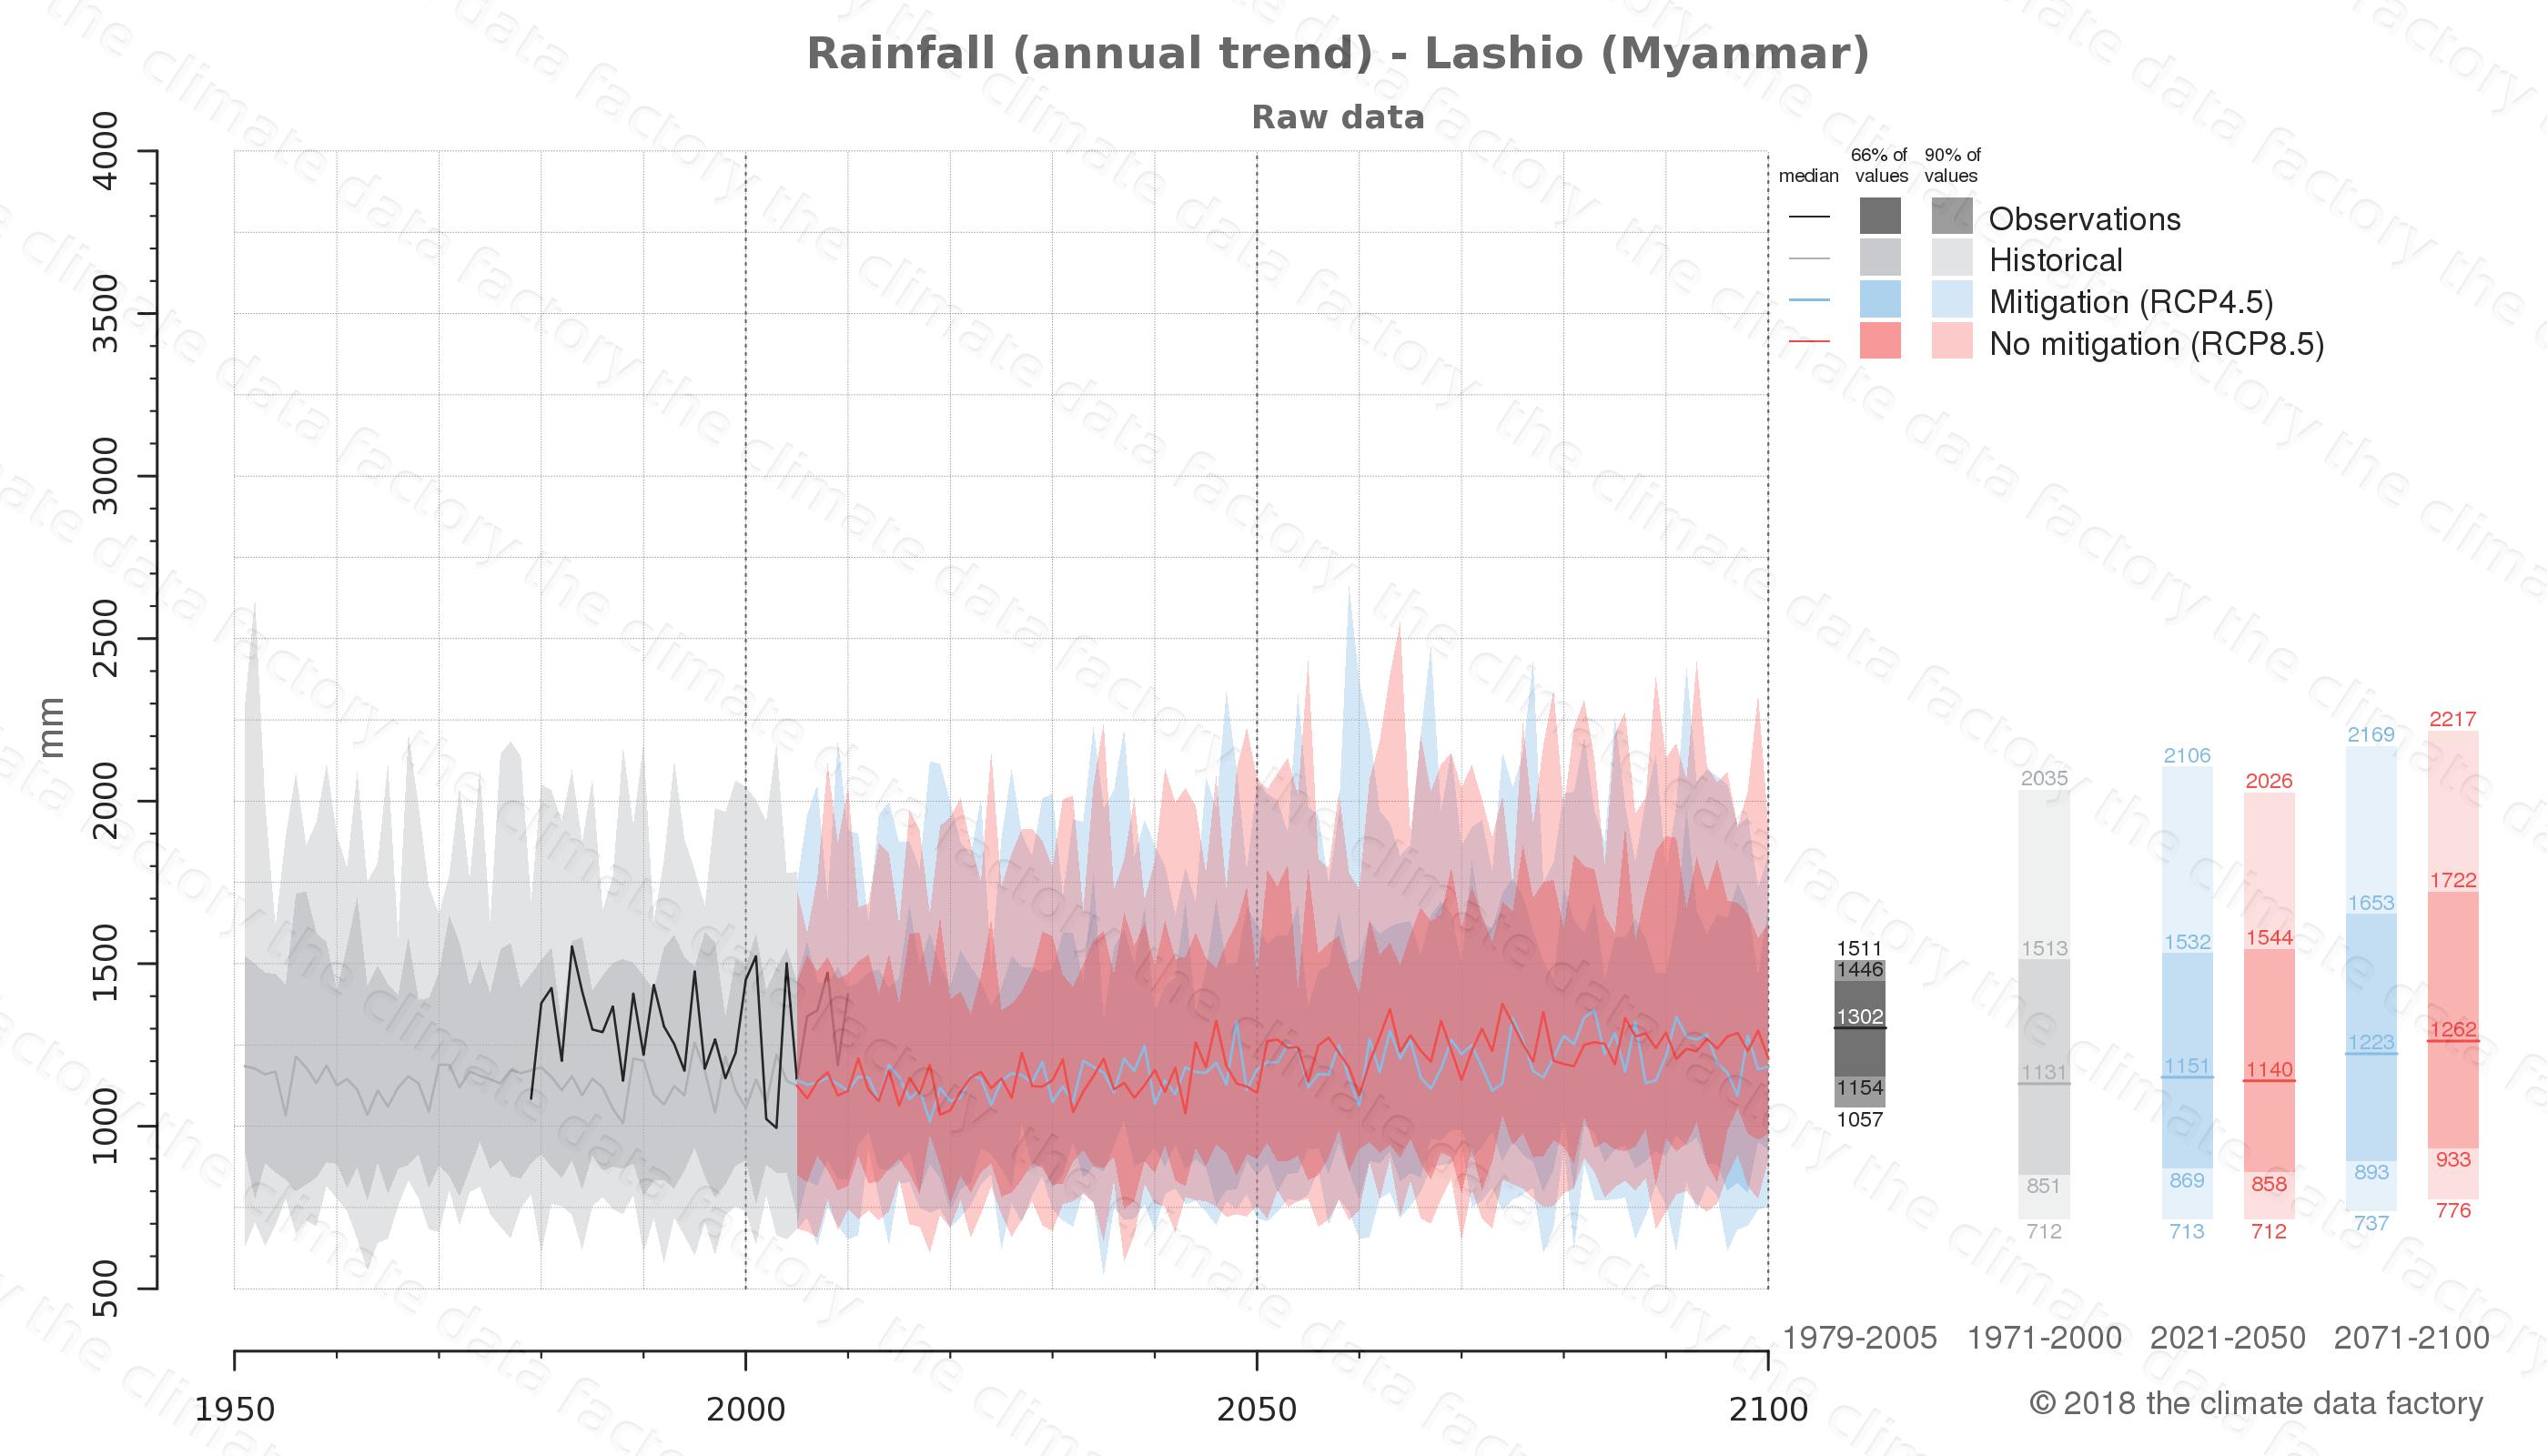 climate change data policy adaptation climate graph city data rainfall lashio myanmar